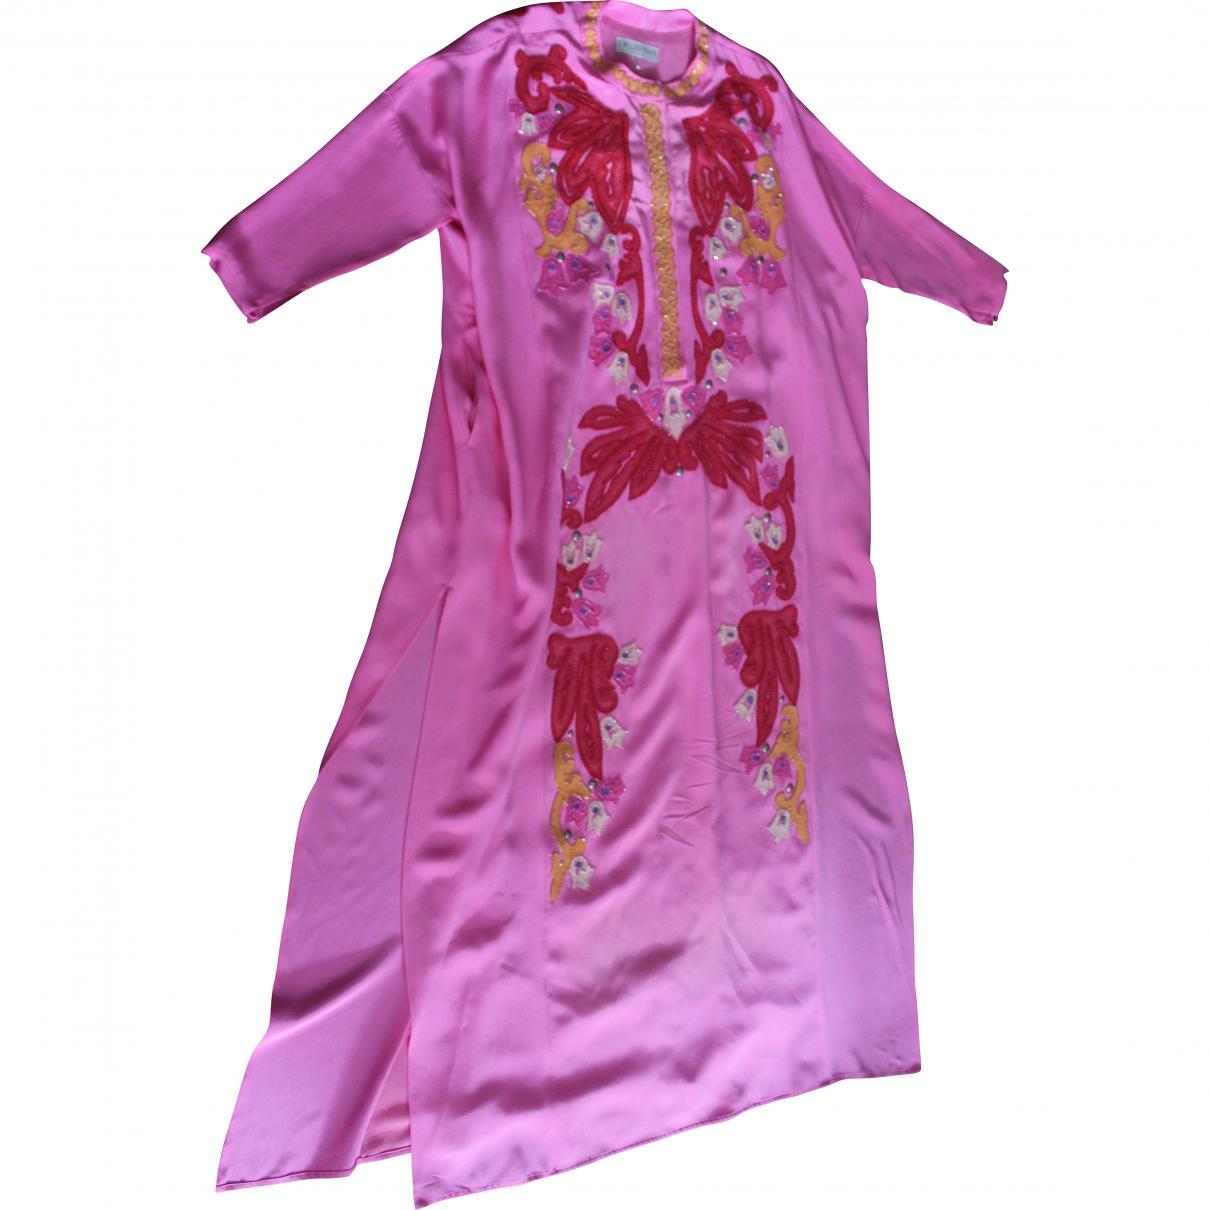 Emilio Pucci \N Pink Silk dress for Women 38 IT